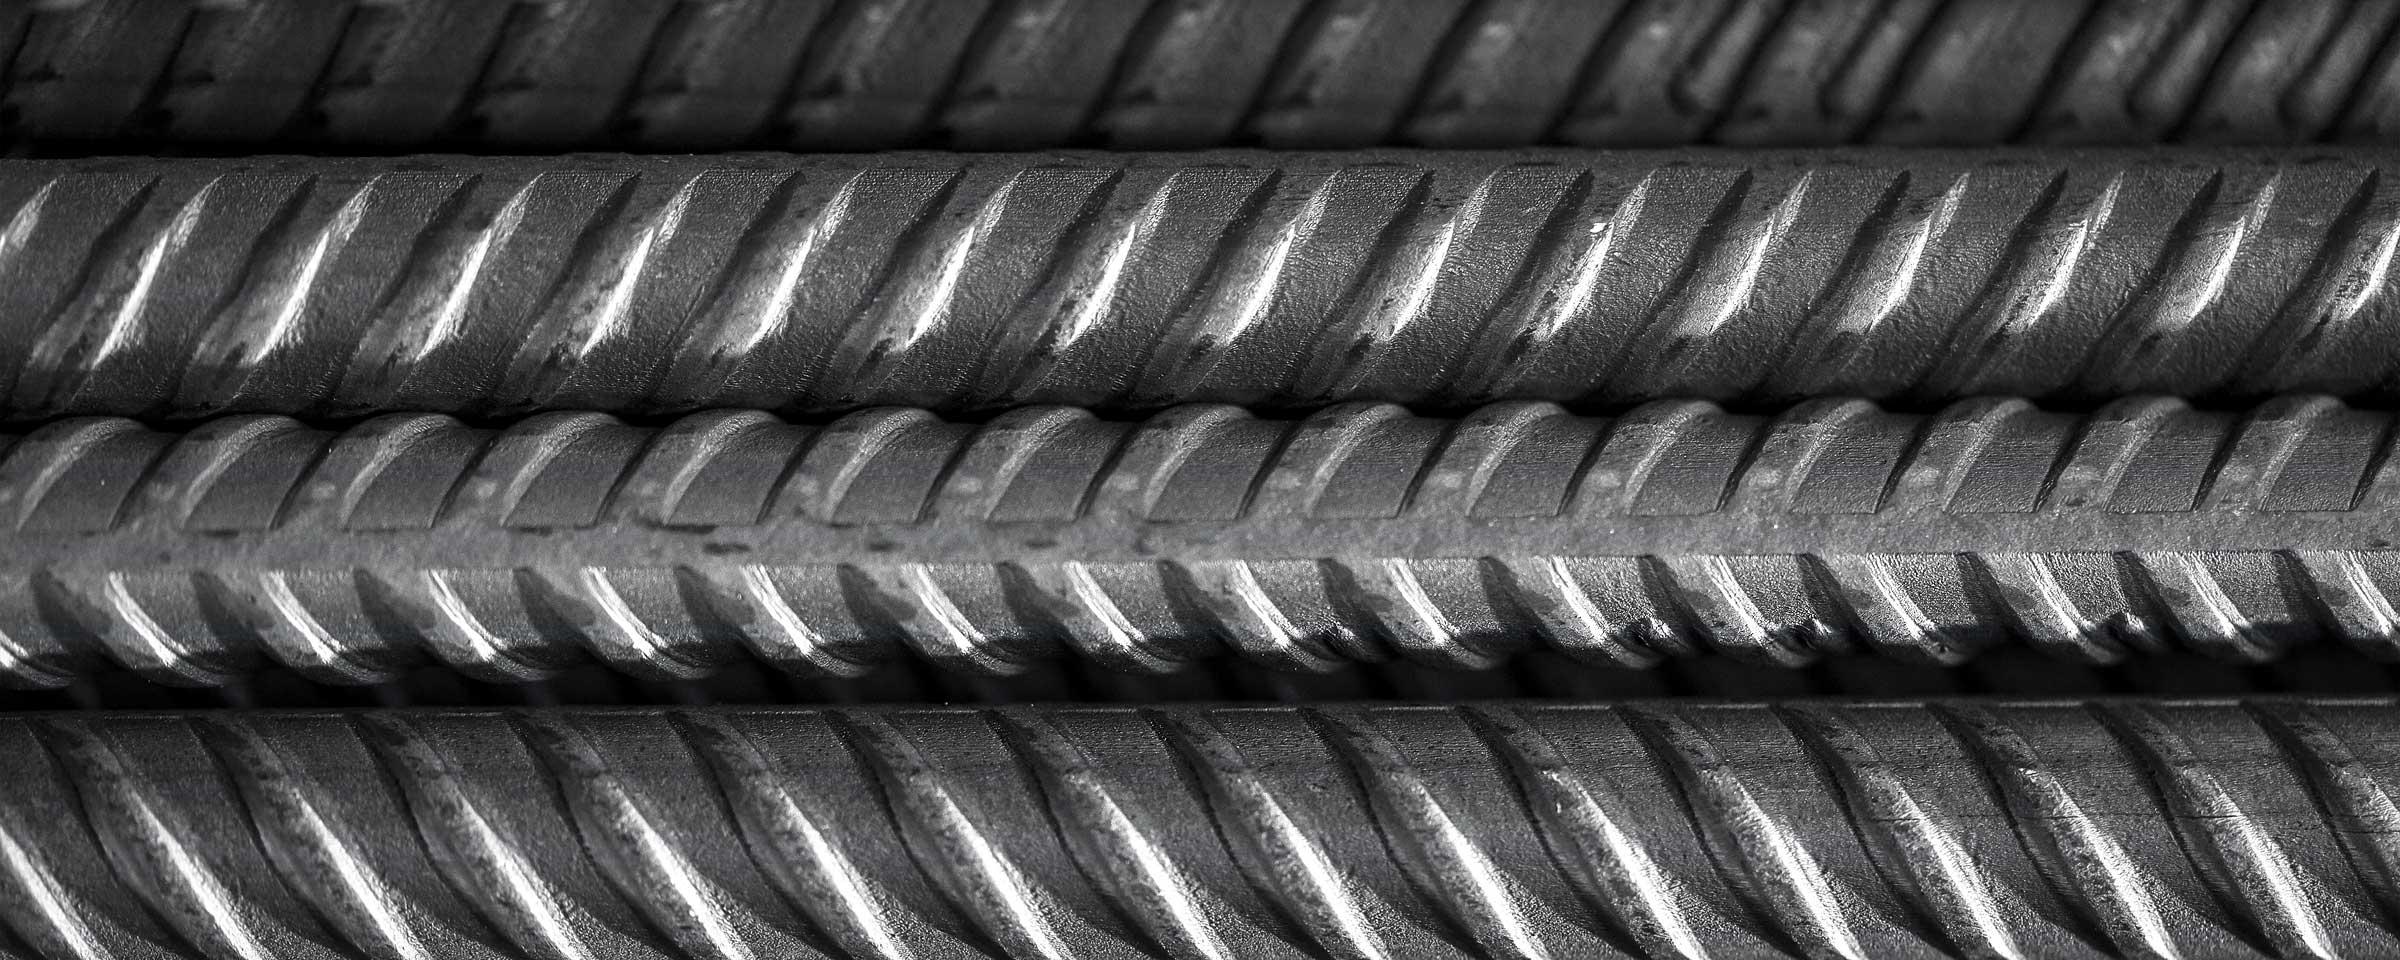 sako-stahl-betonstahl-stahlbeton-produkte